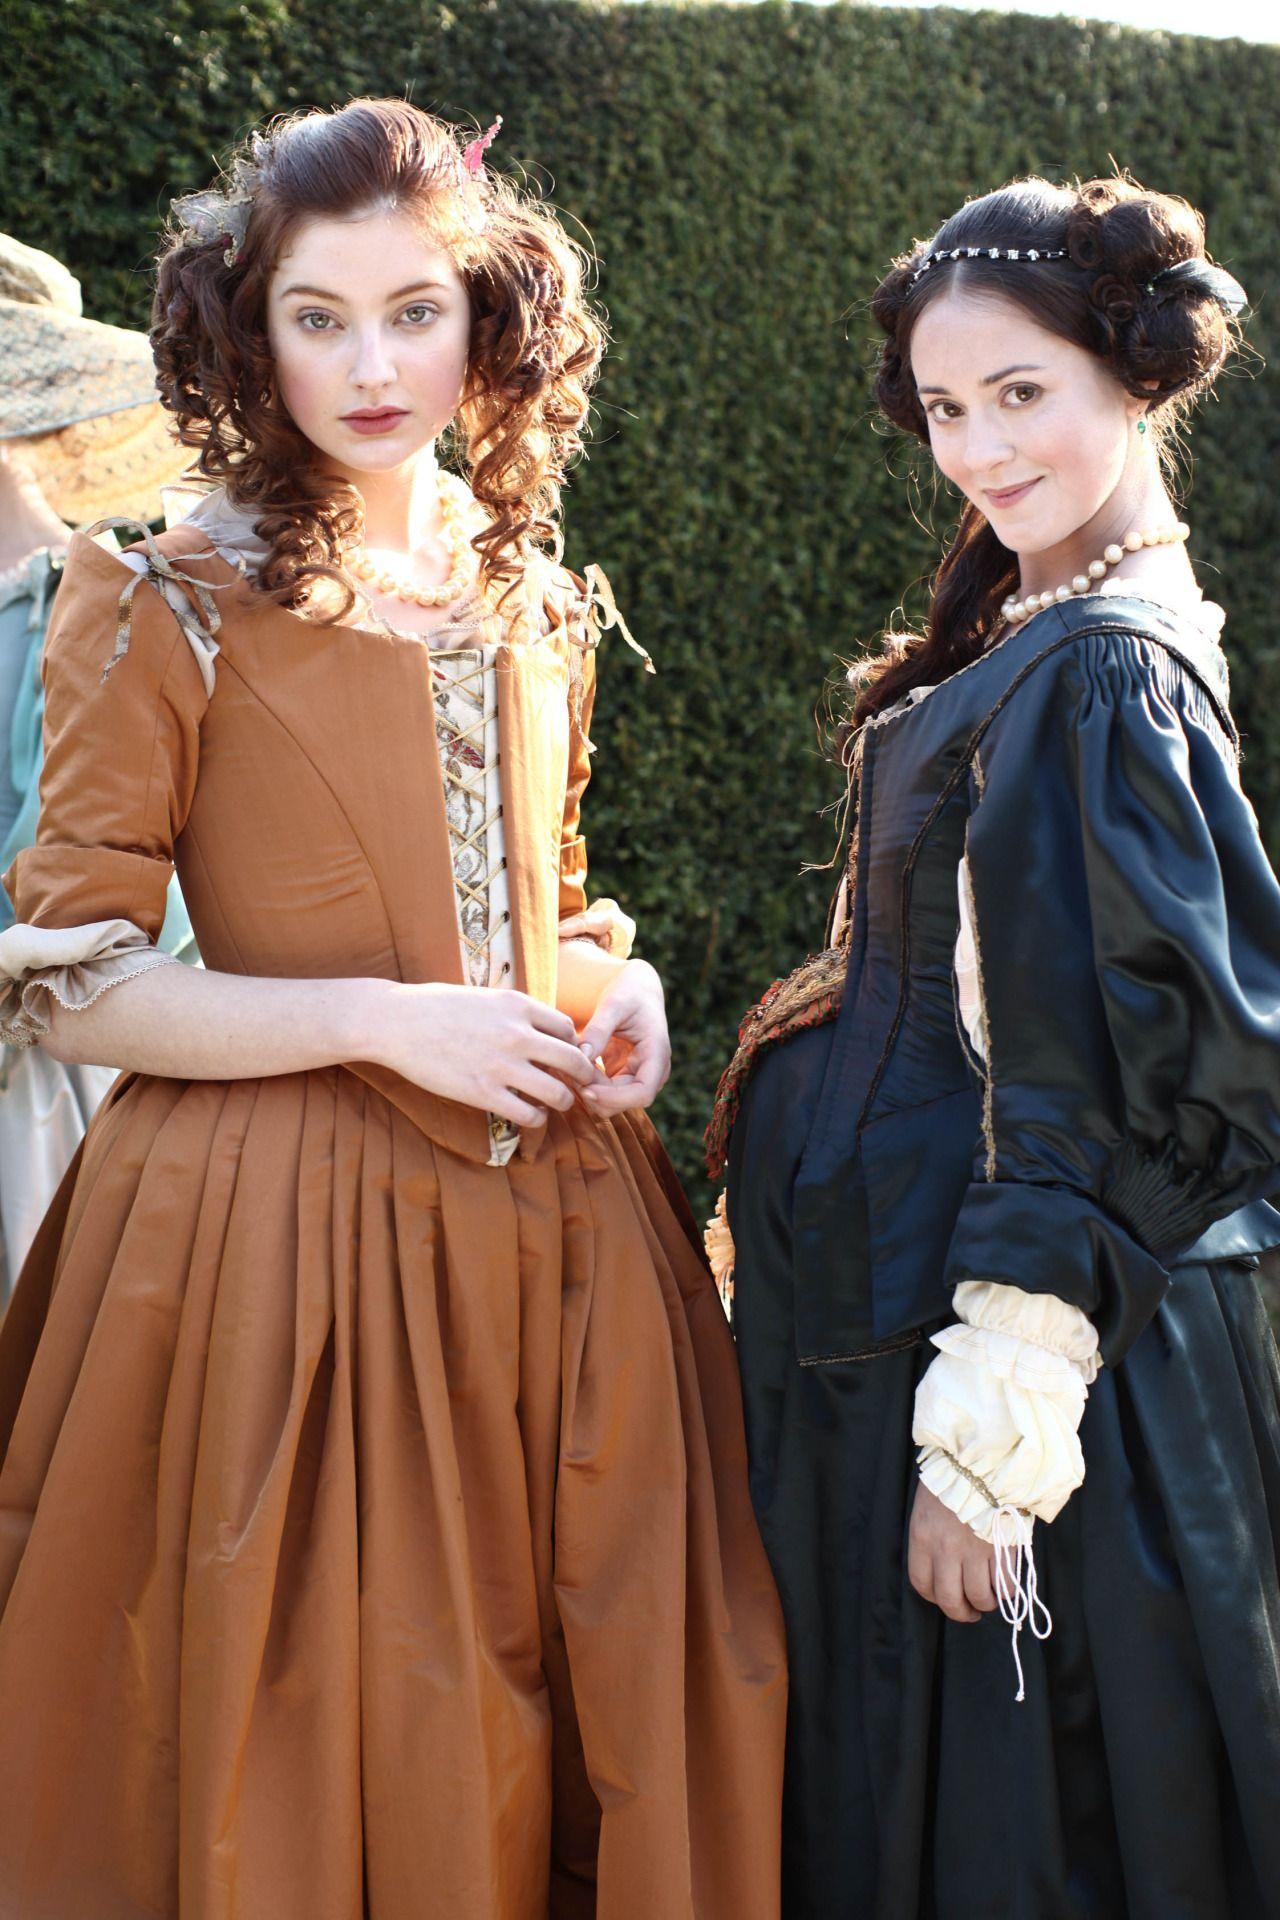 Antonia Clarke as Frances Stewart and Susannah Fielding as